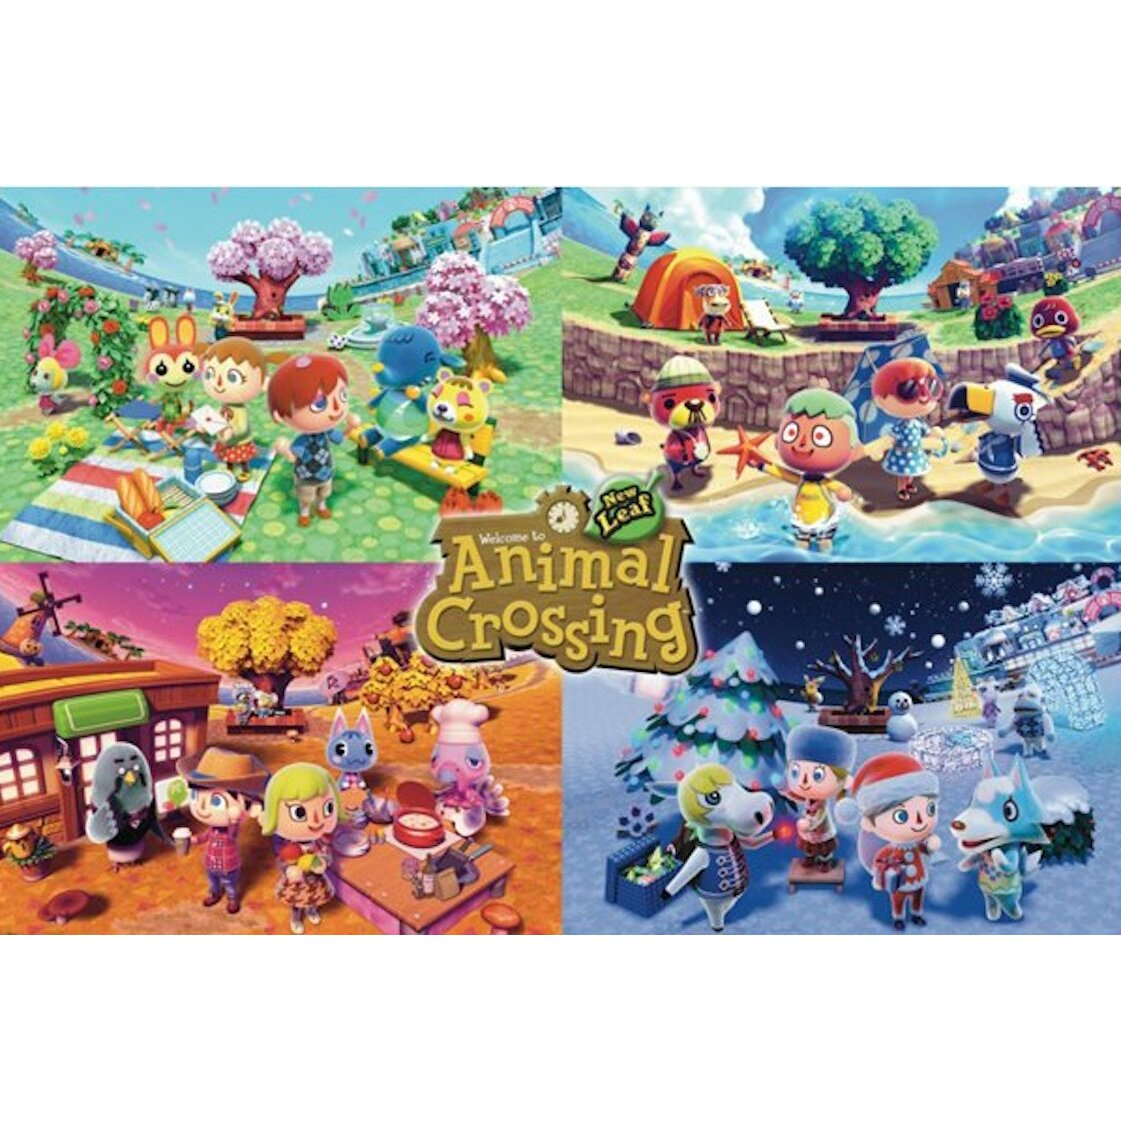 54115-animal-crossing-four-seasons-poster